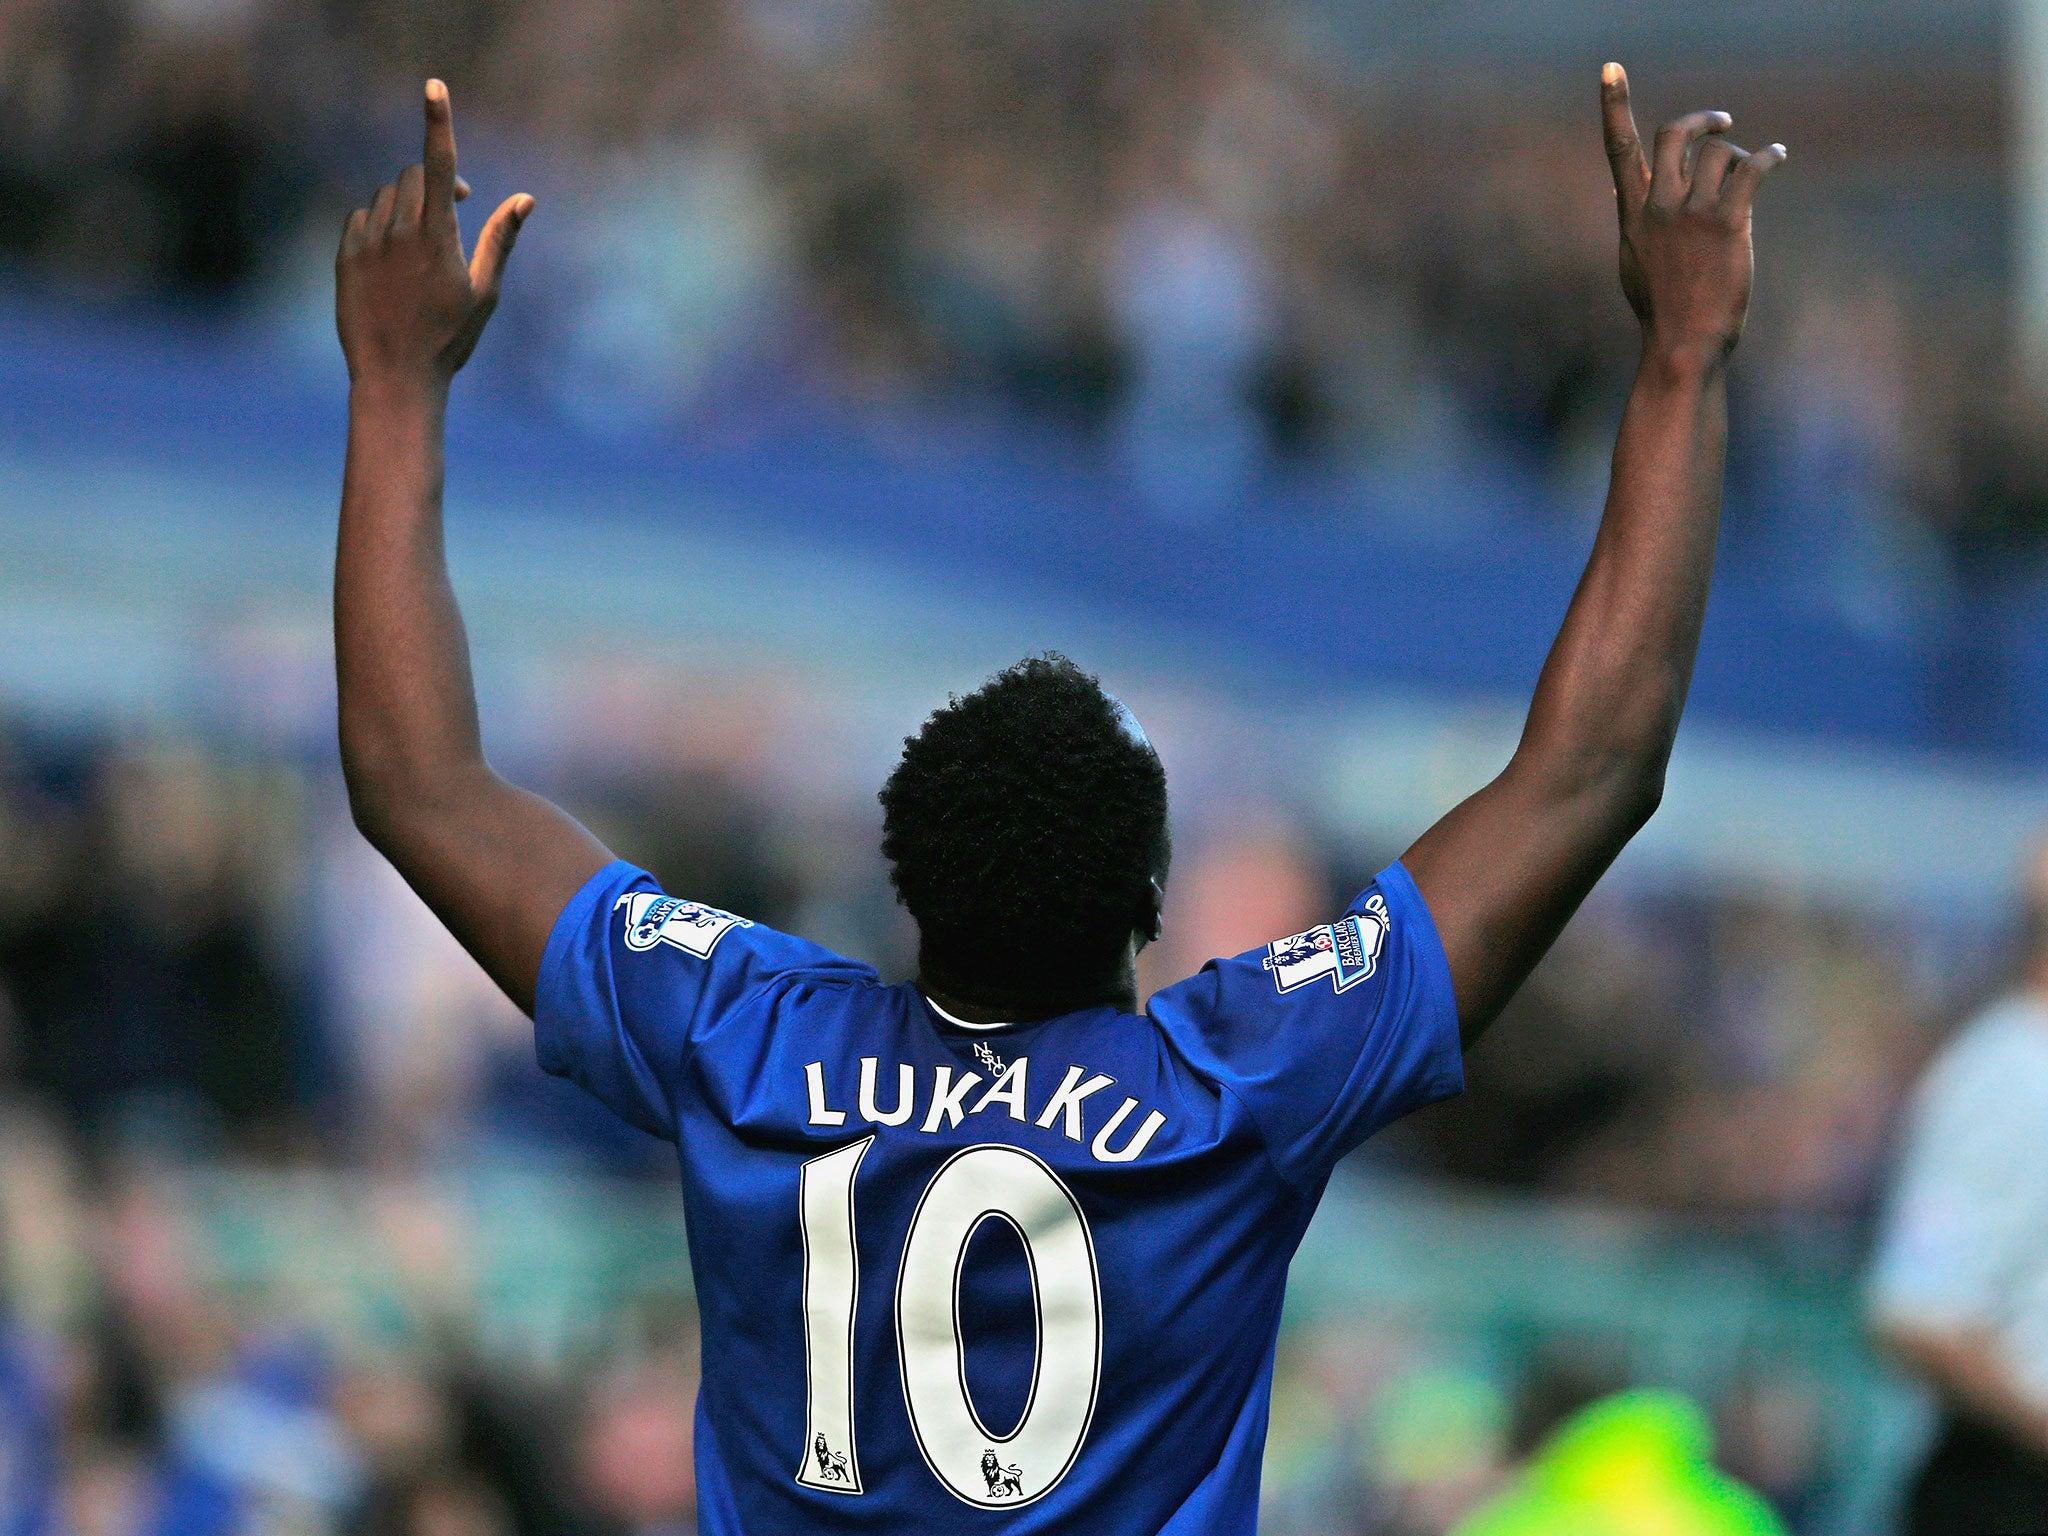 Romelu Lukaku Transfer Latest: Everton Manager Roberto